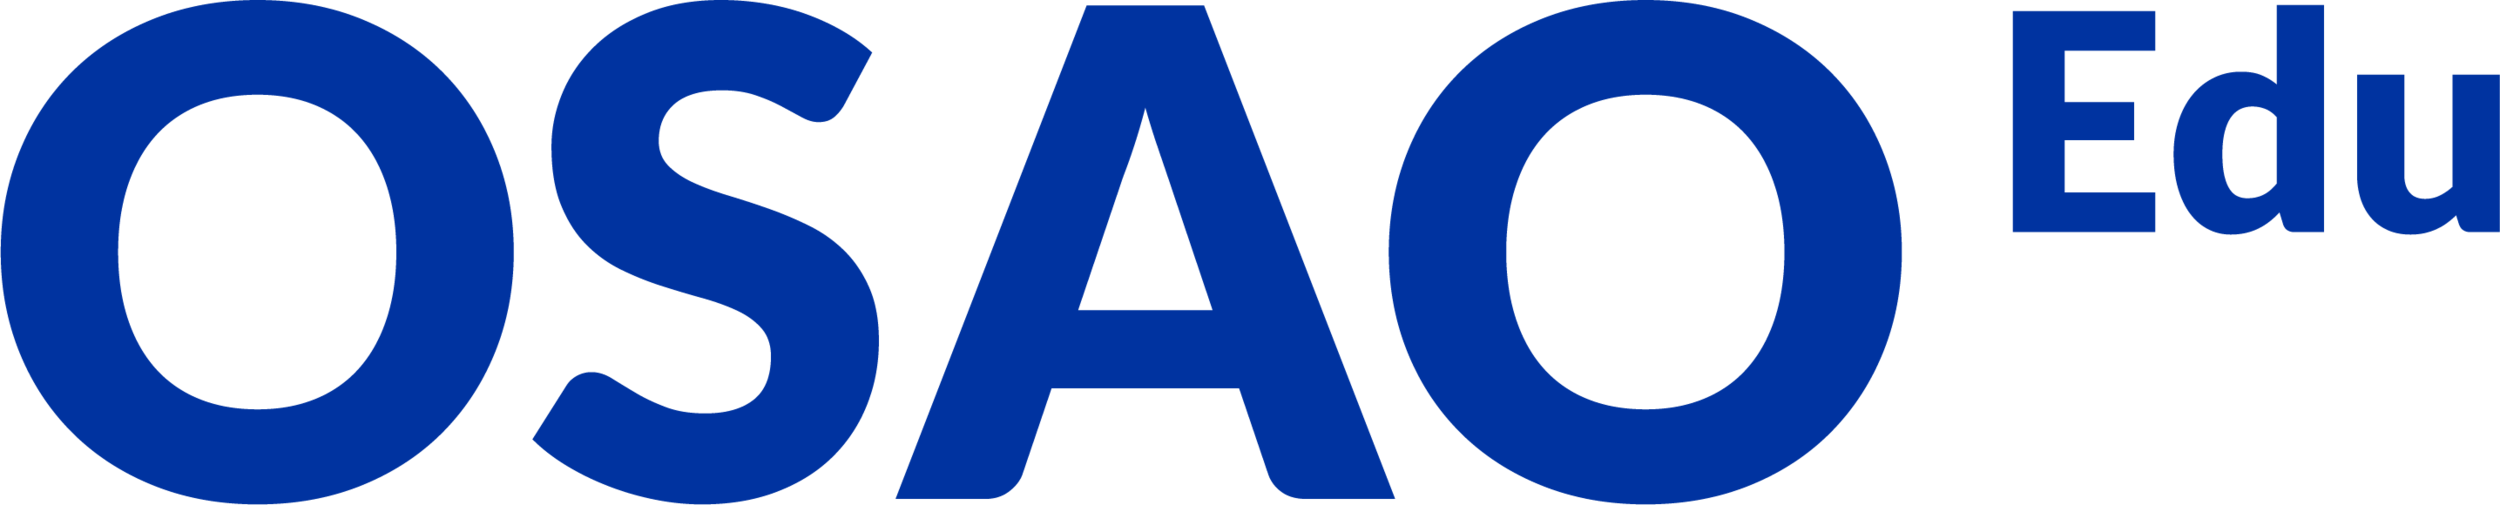 OSAO_Edu_Logo_RGB_sininen.png